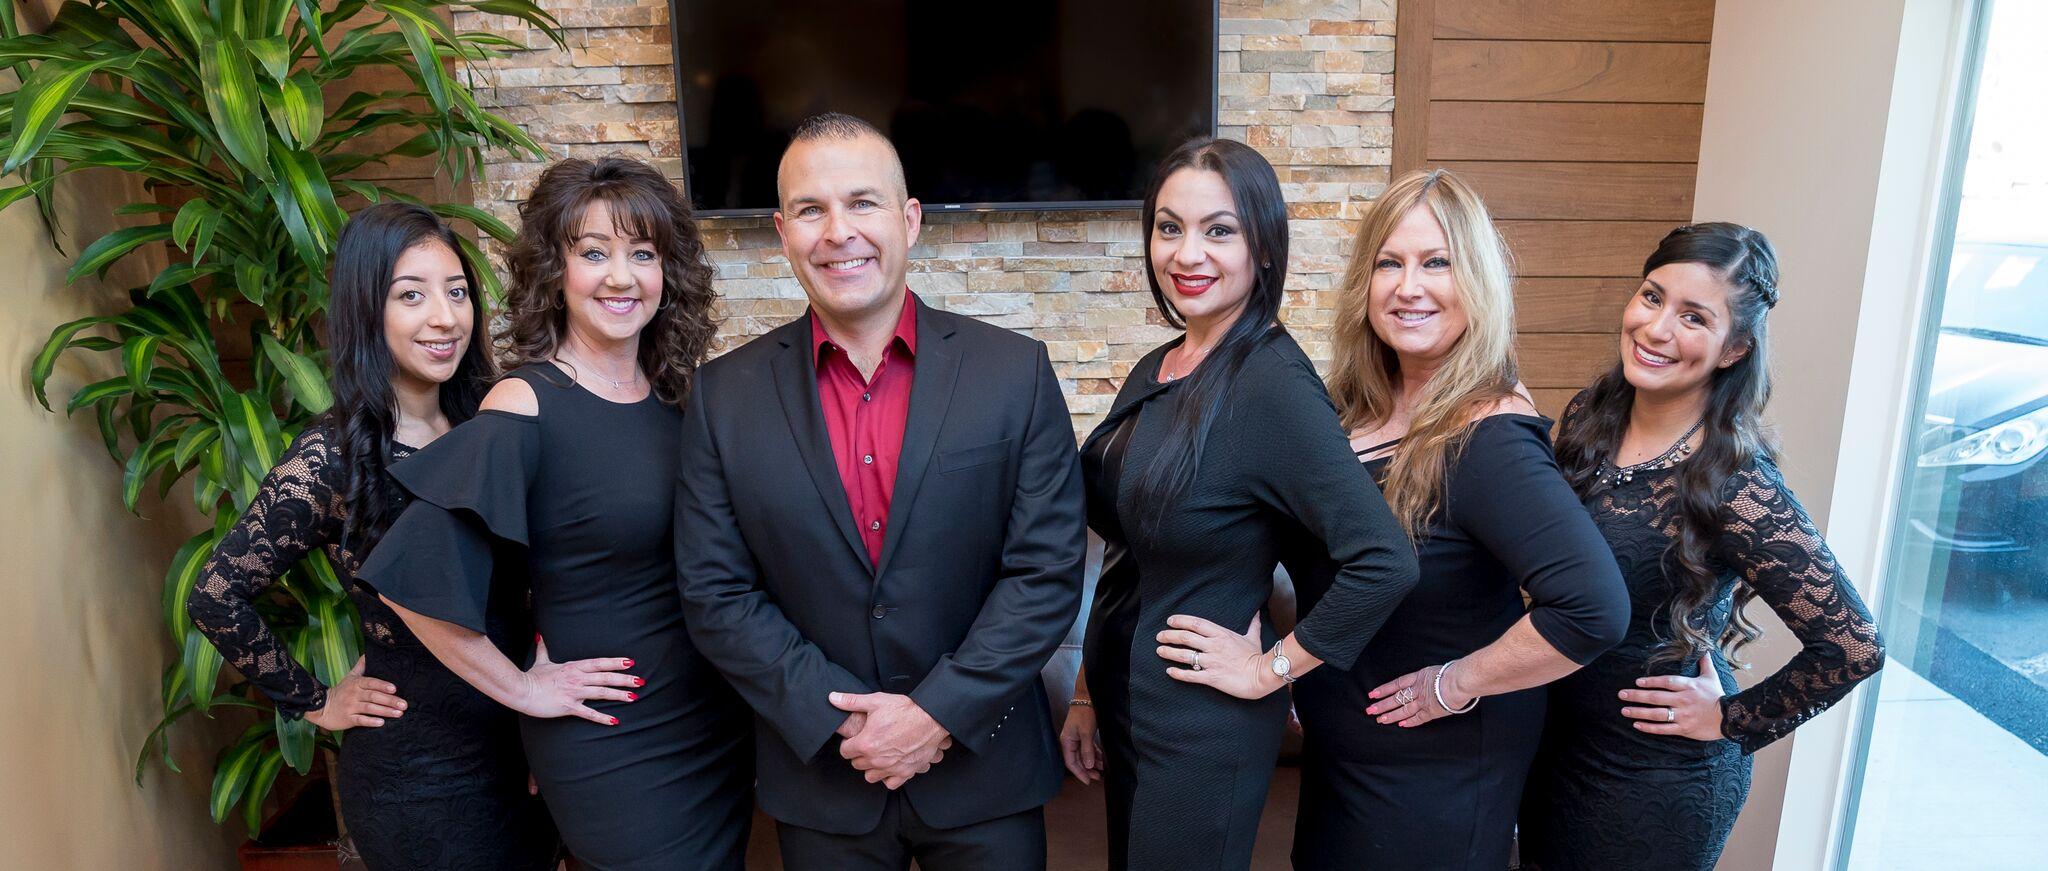 Alan L. Frame DDS dental team